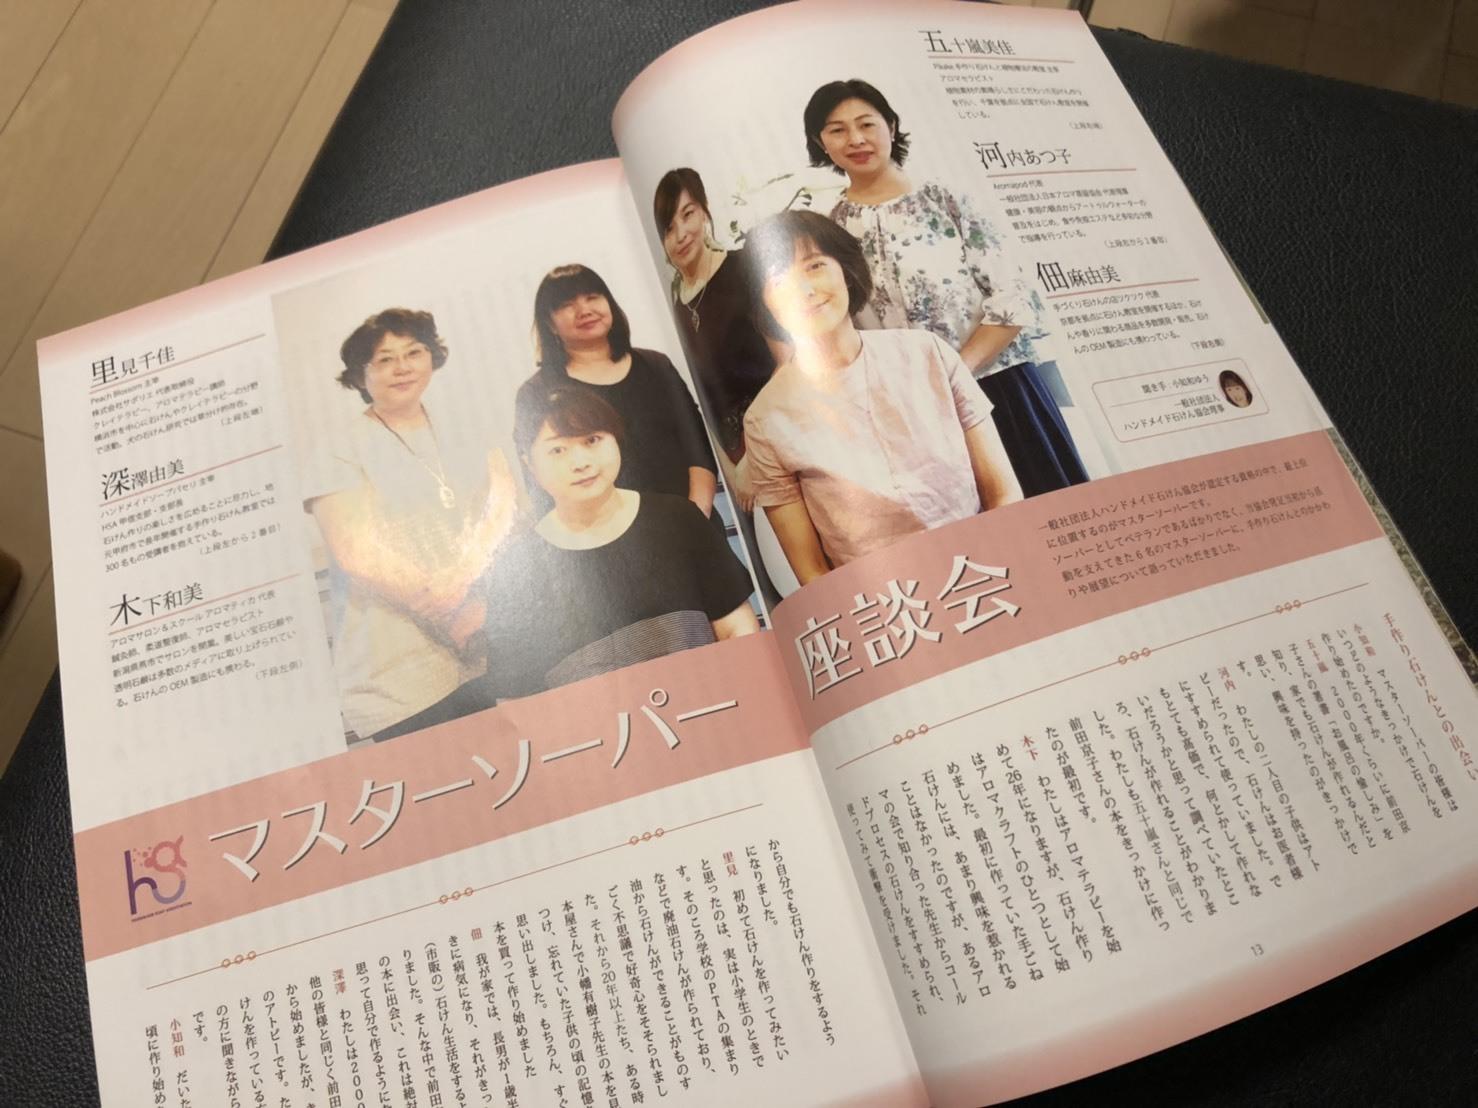 S__4669506.jpg